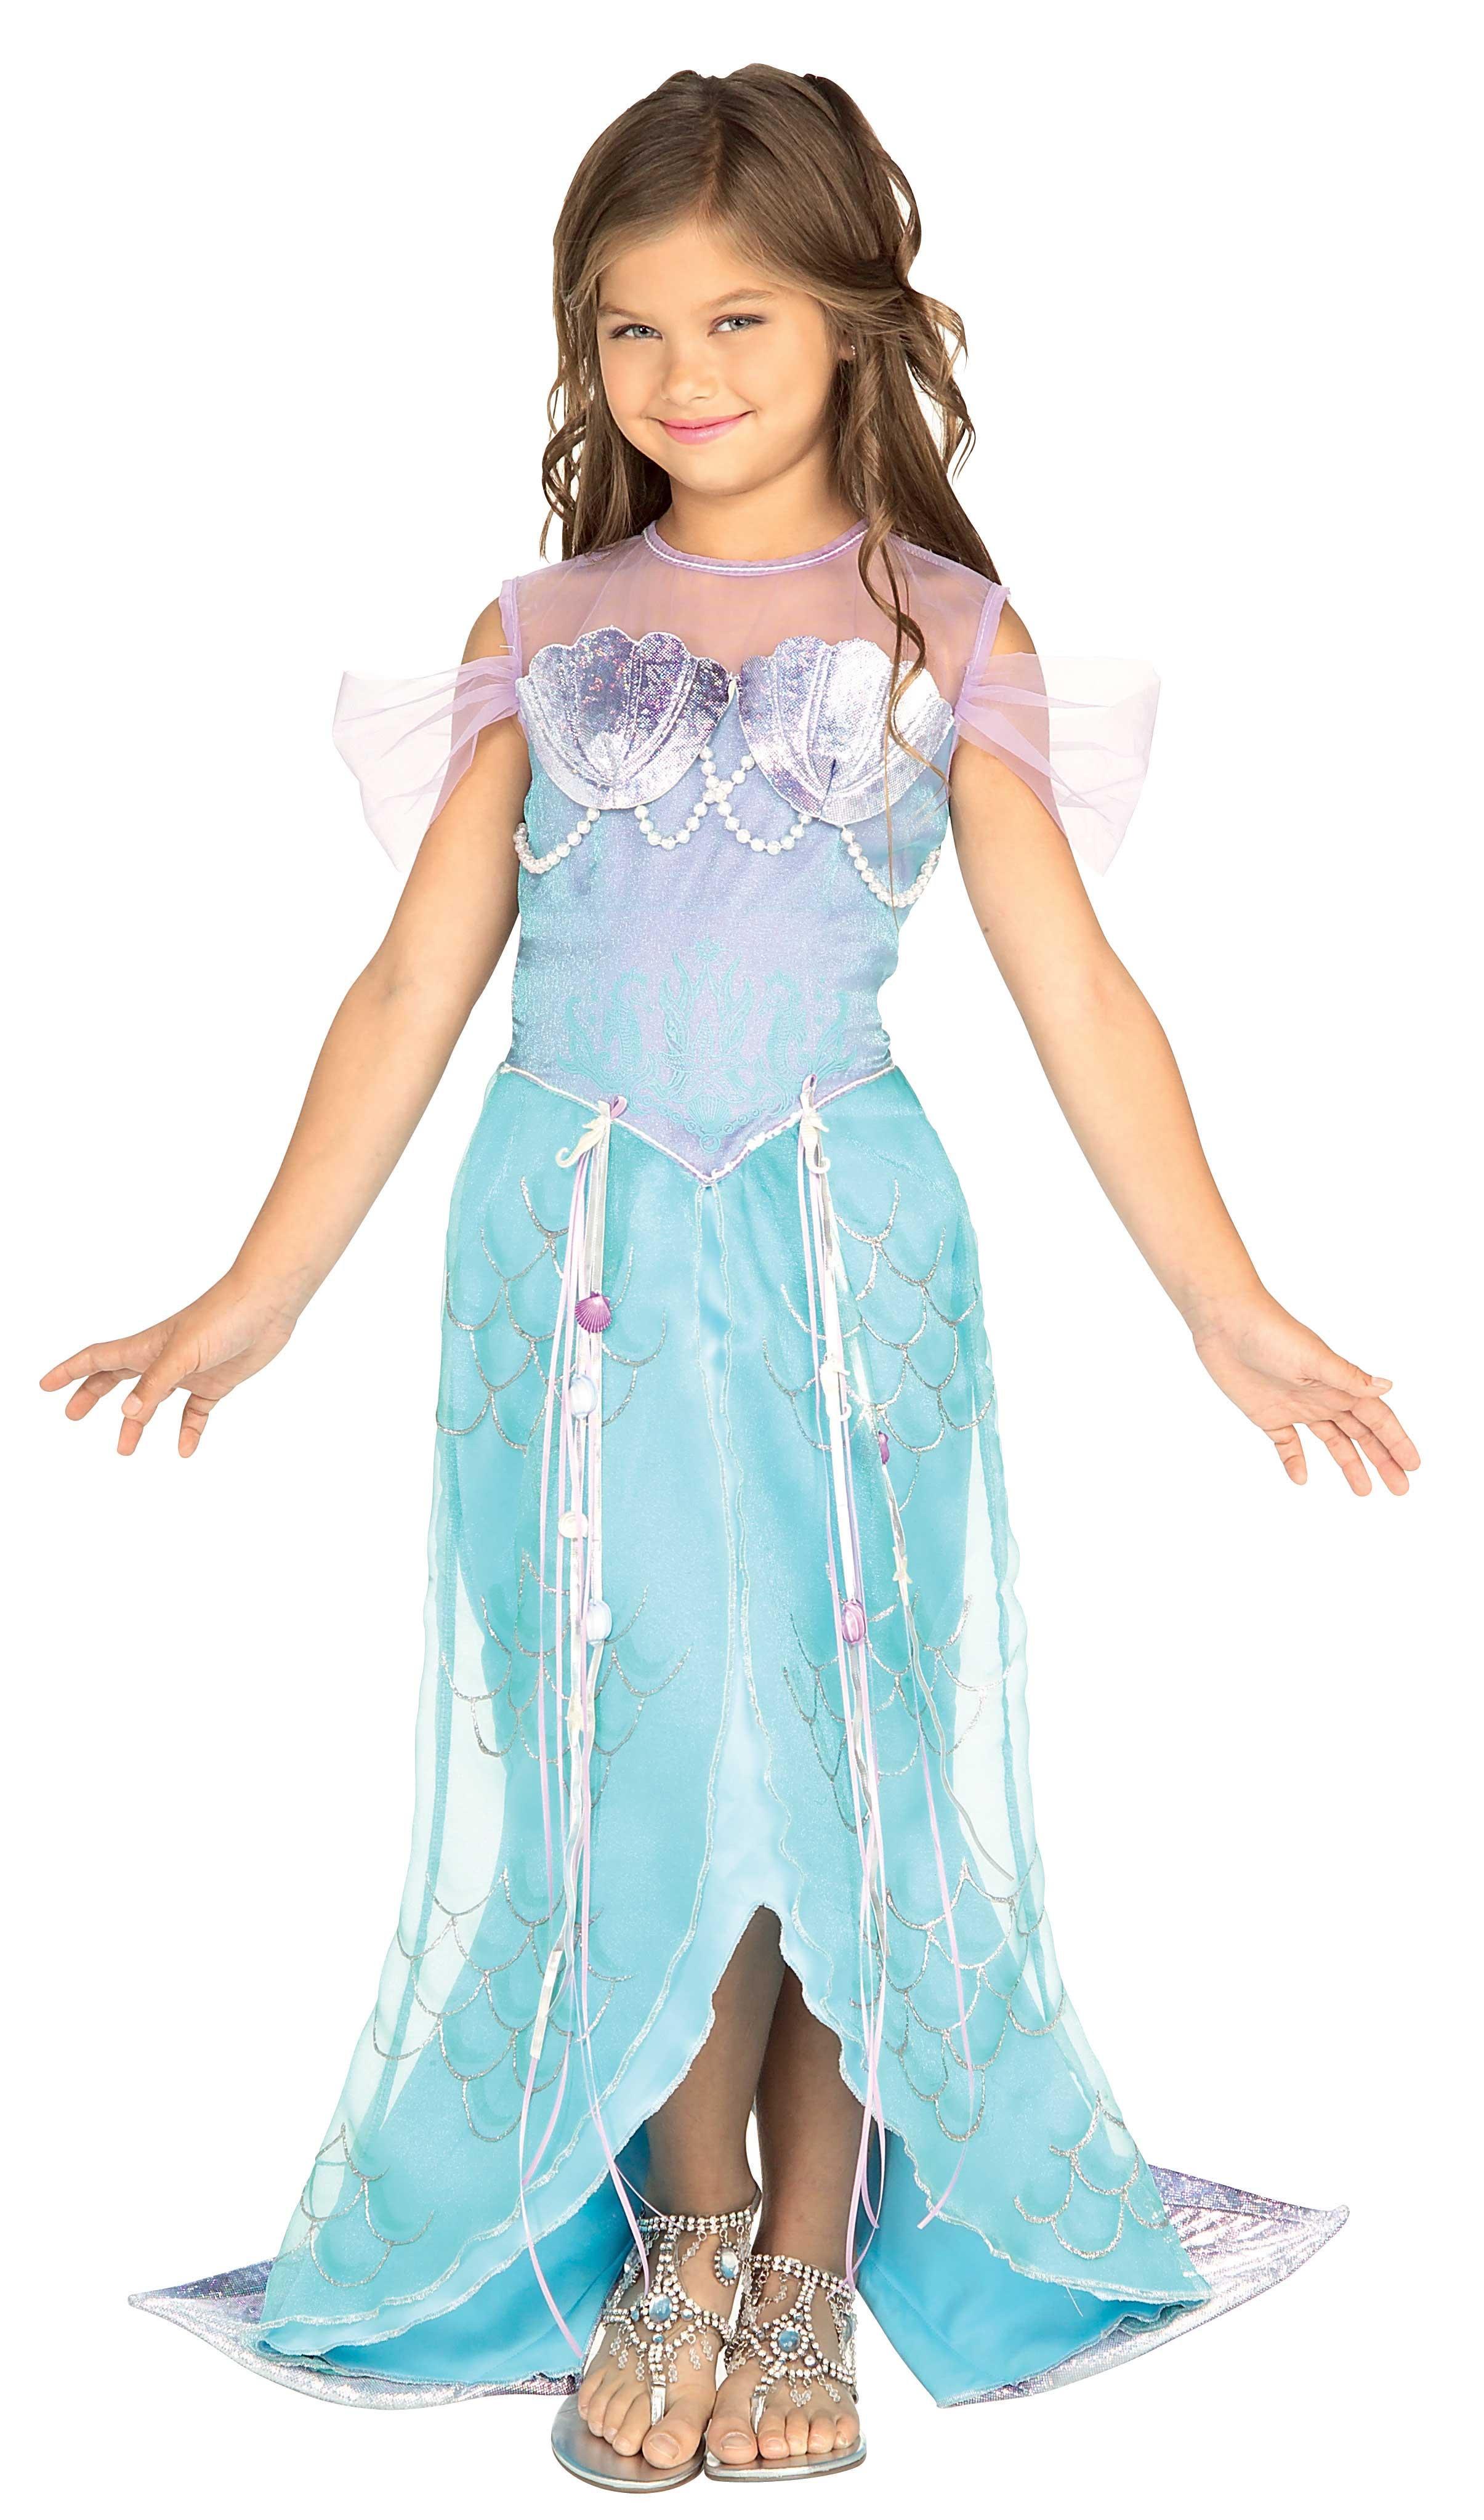 Sea Shell Cutie Mermaid Kids Costume